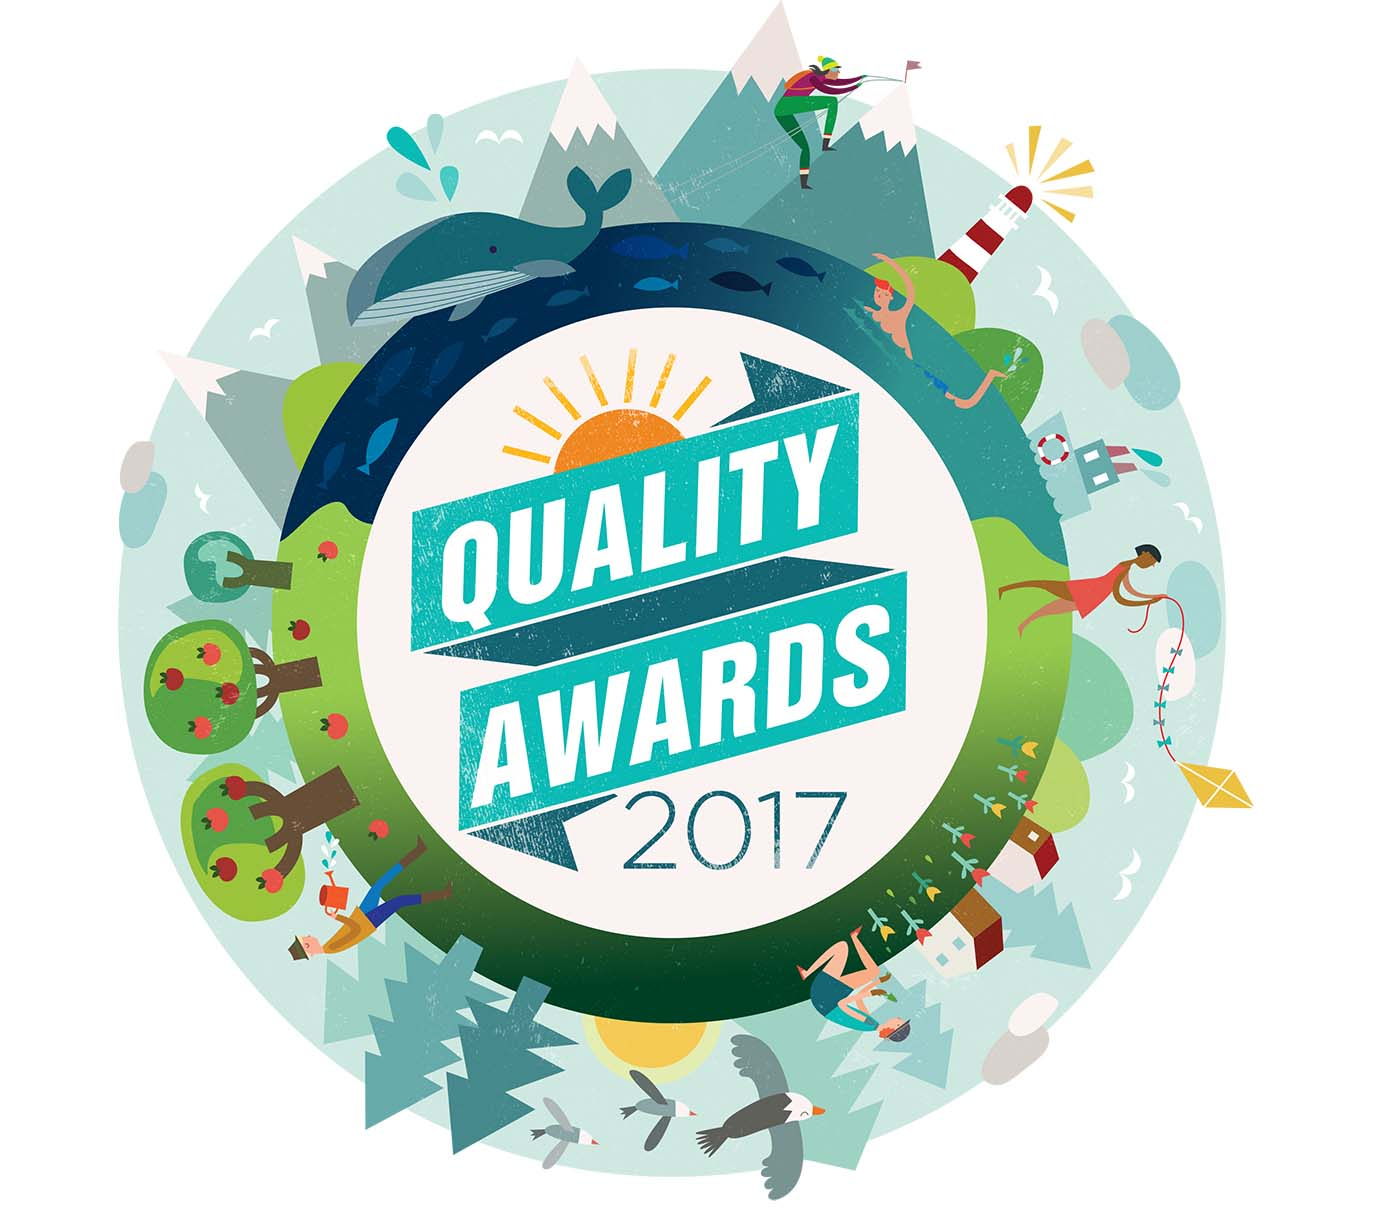 Quality Awards 2017